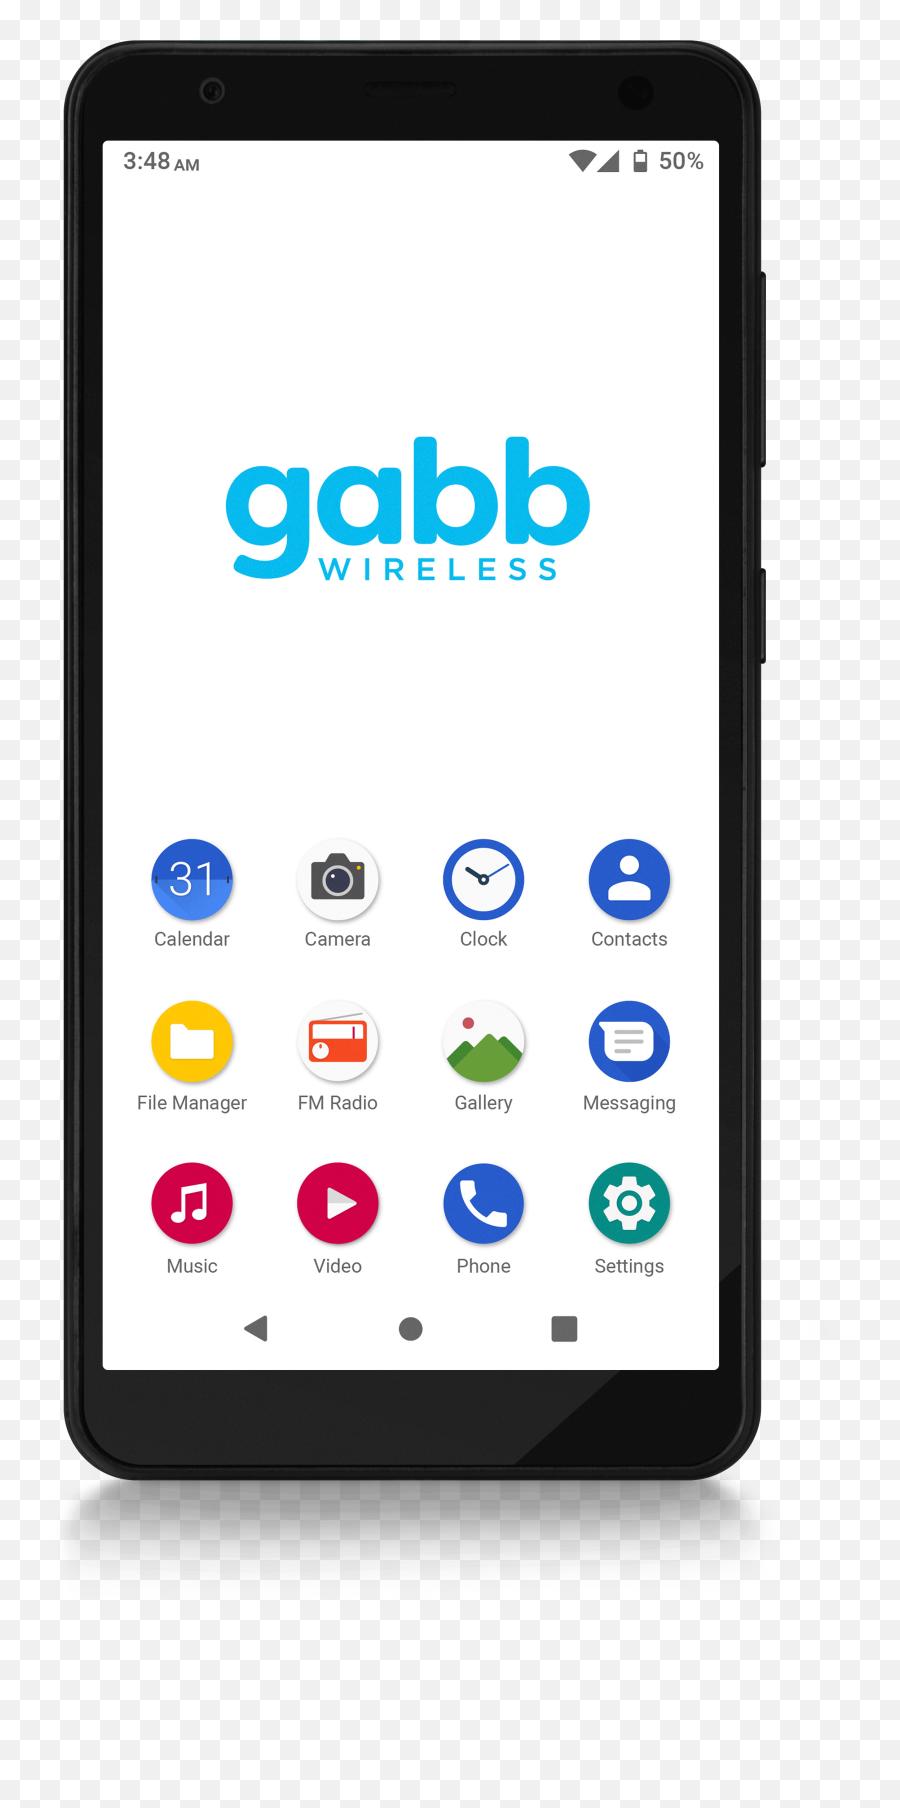 Z2 - Gabb Z2 Emoji,Cell Phone Emoji